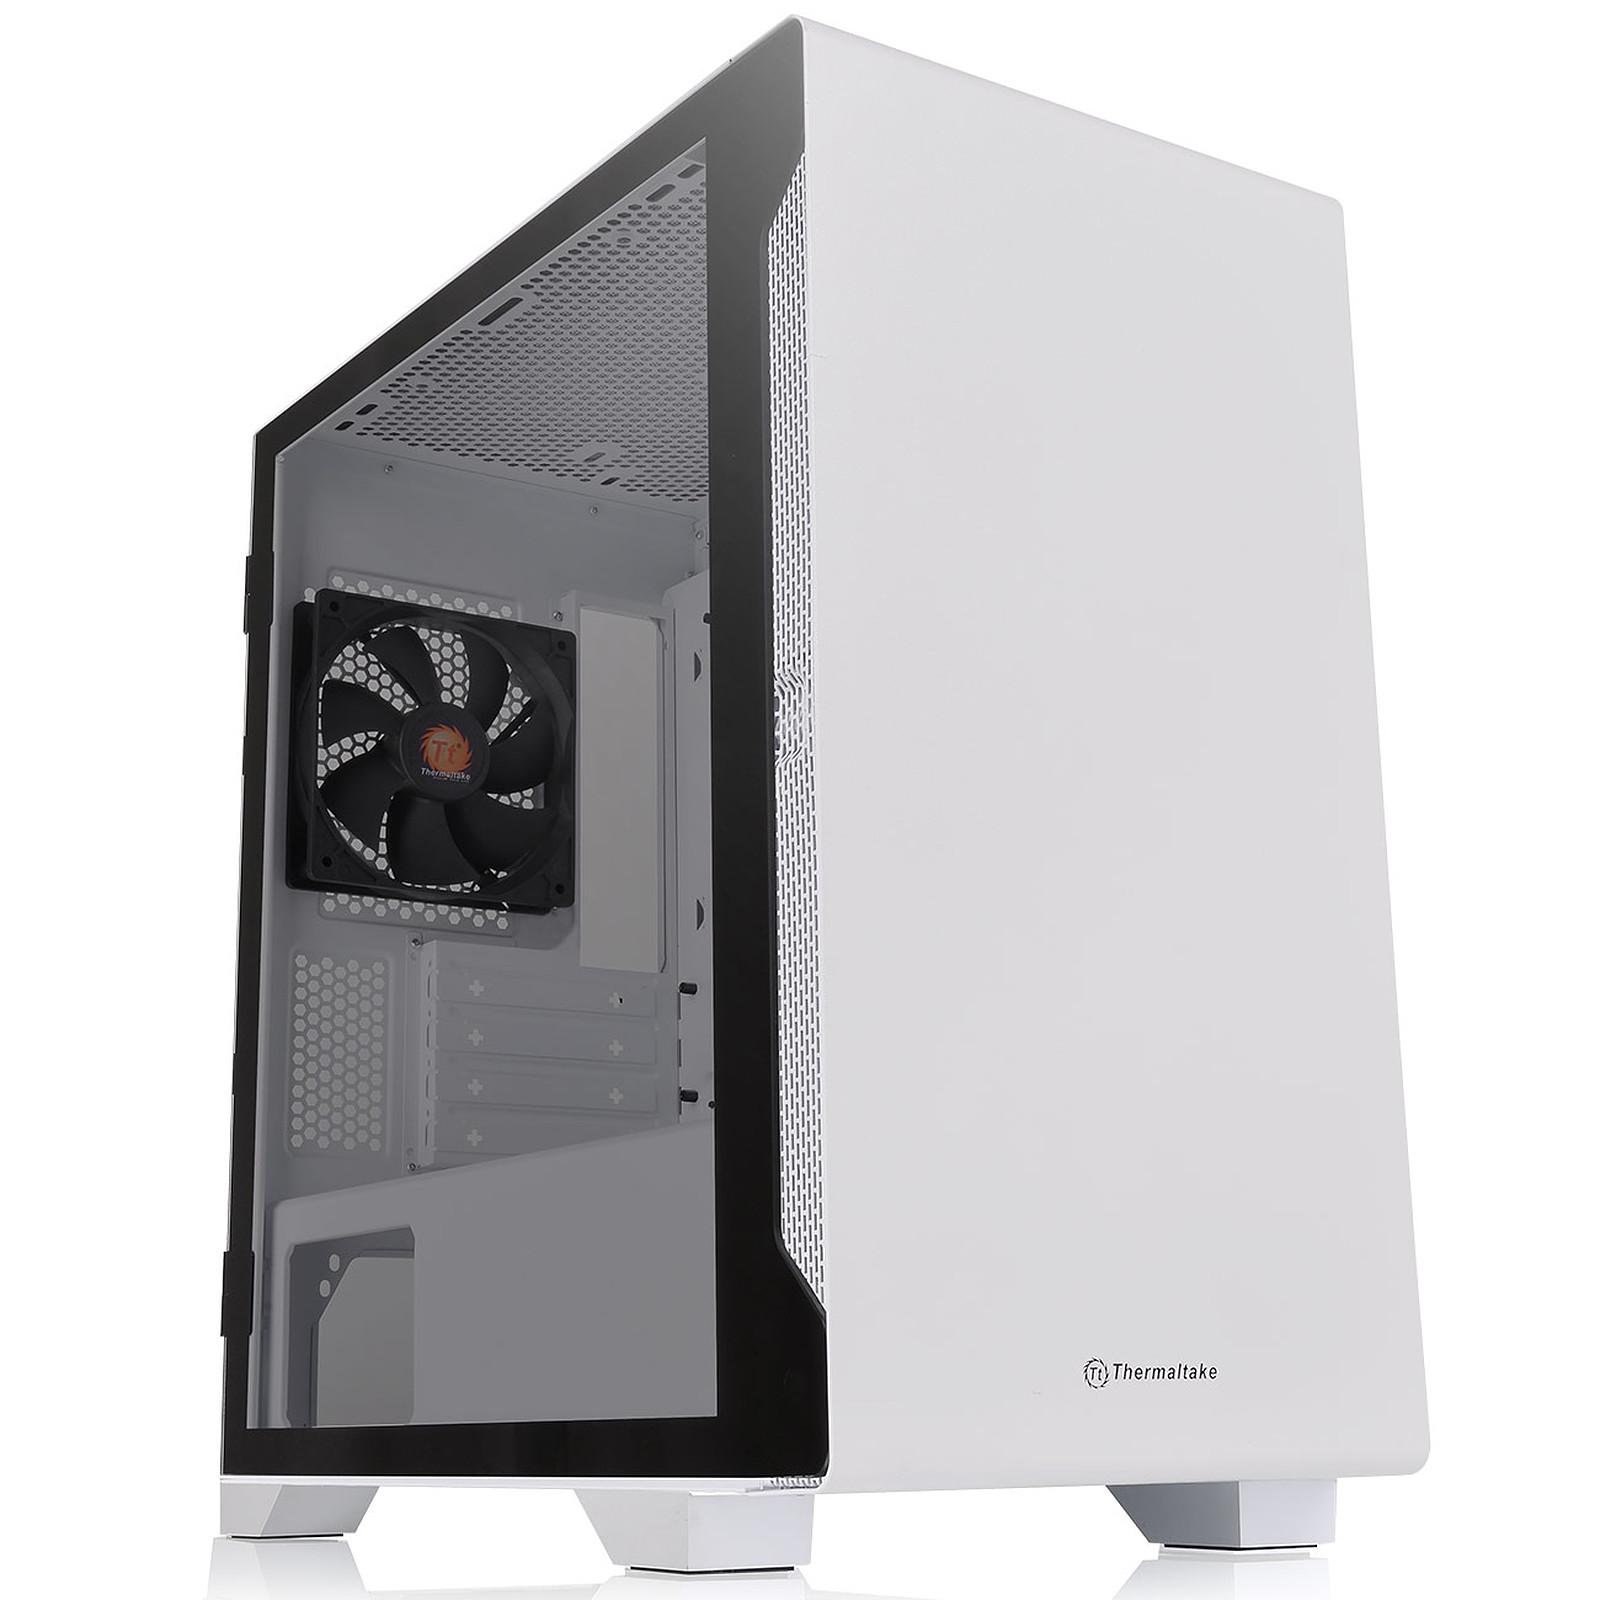 Thermaltake S100 TG White